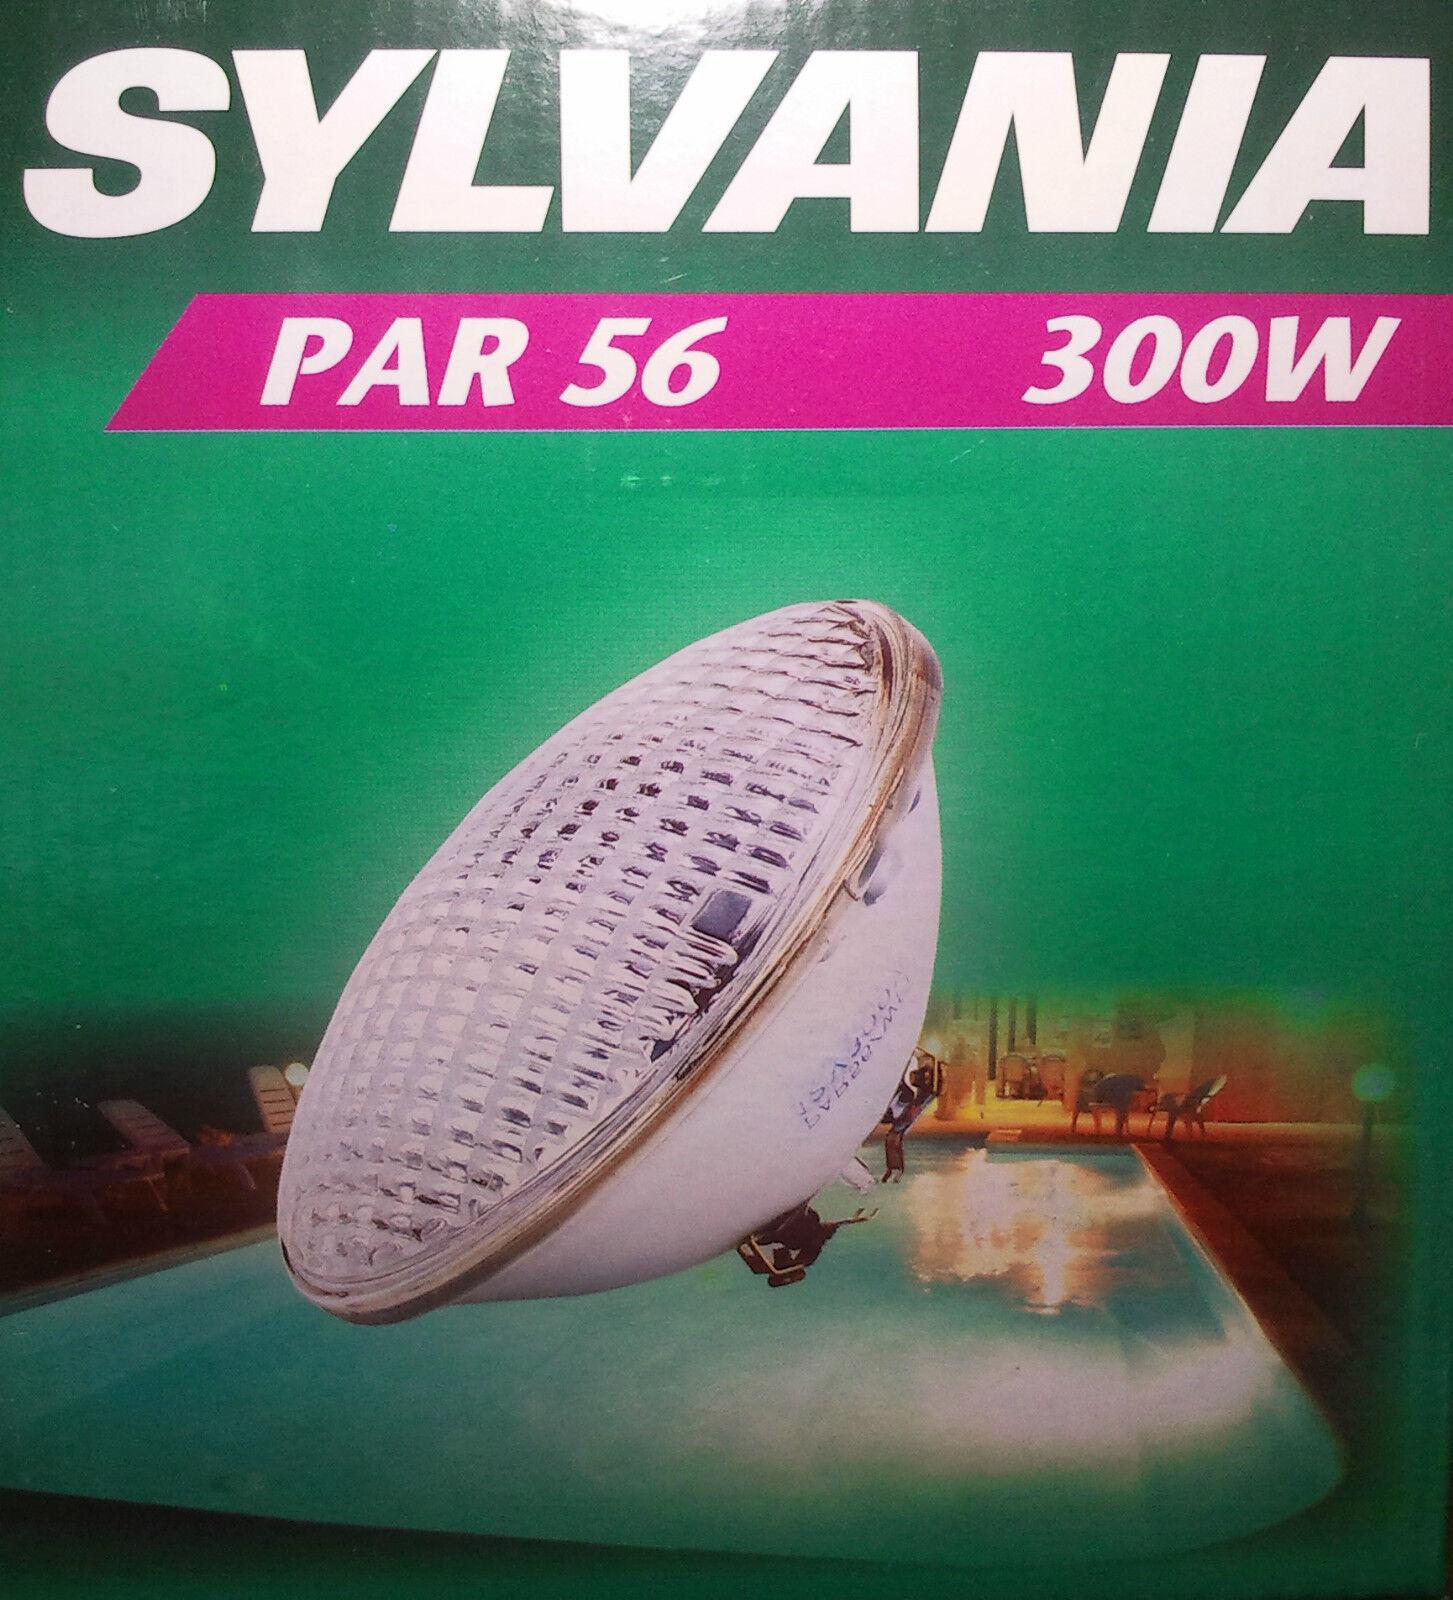 Bombilla sylvania par56 12v 300w lampara foco piscina ebay for Lamparas para piscinas